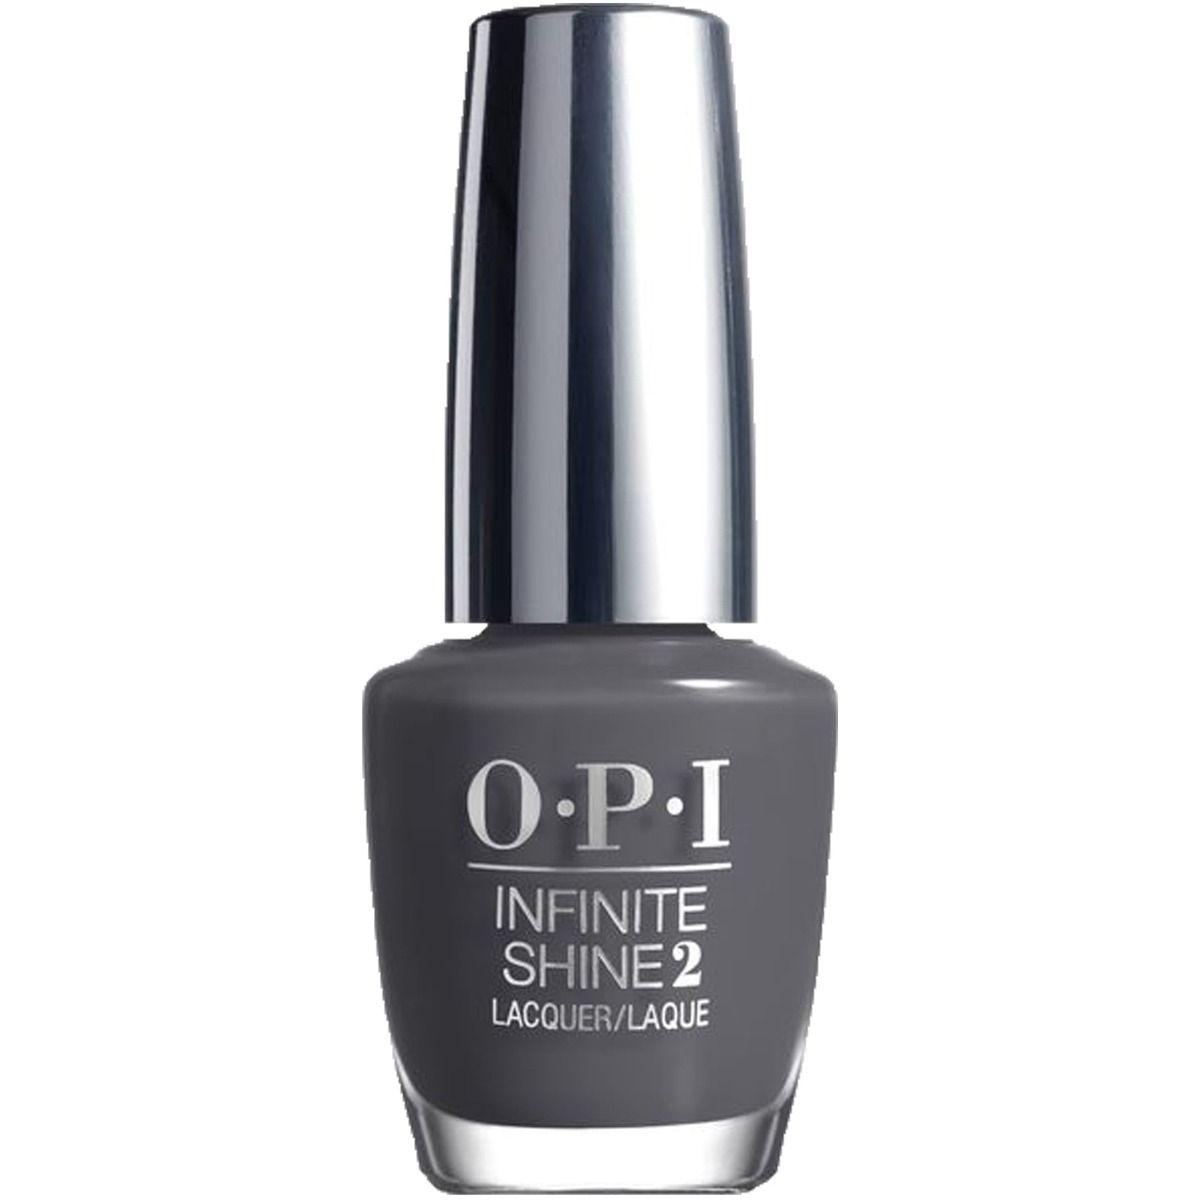 OPI Infinite Shine Steel waters run deep